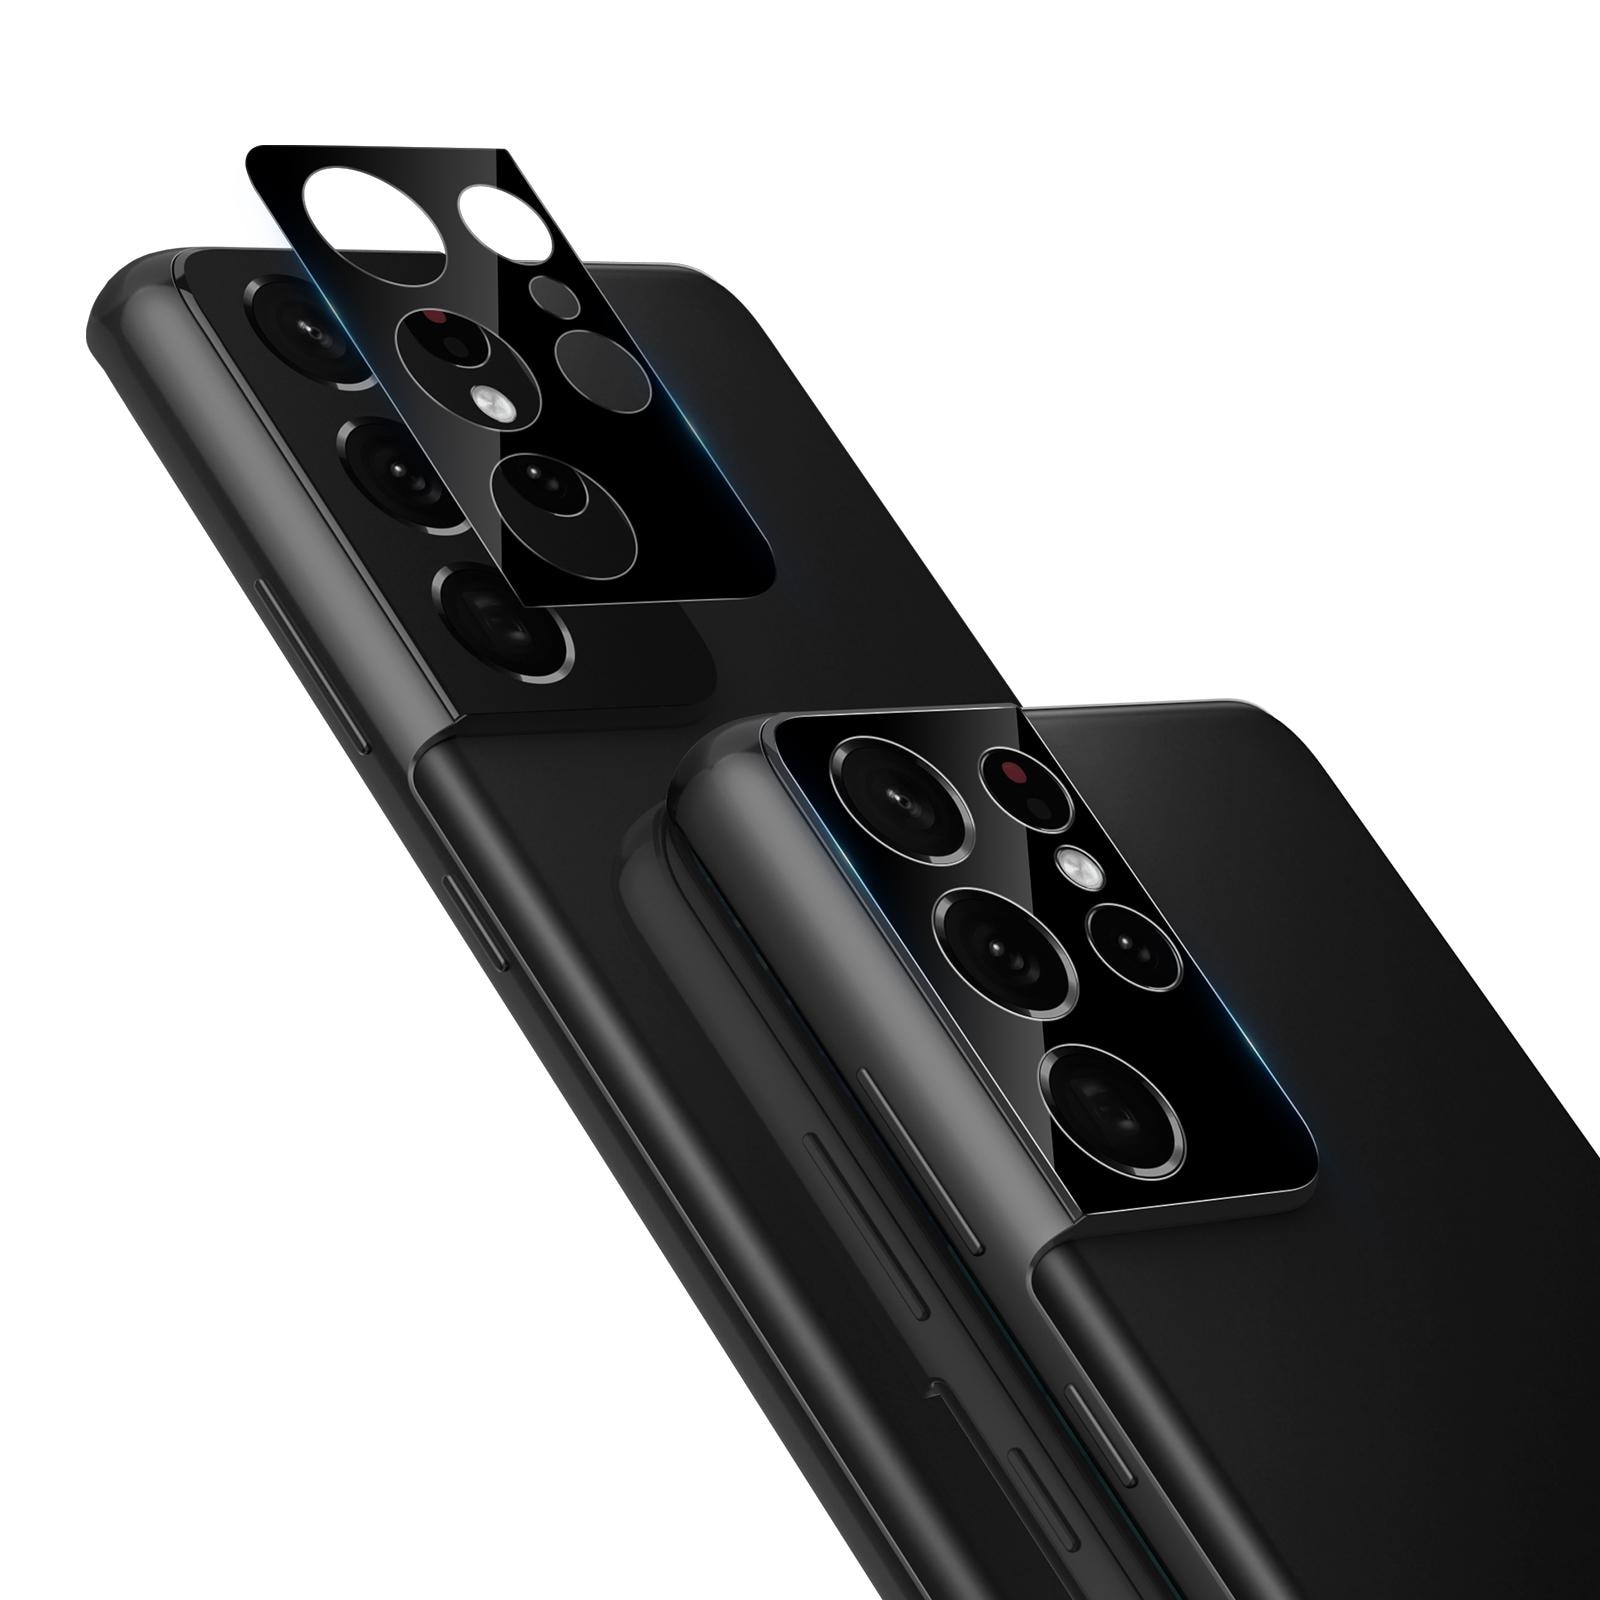 0.22mm InvisiFilm Kameraskydd Galaxy S21 Ultra (2-pack)